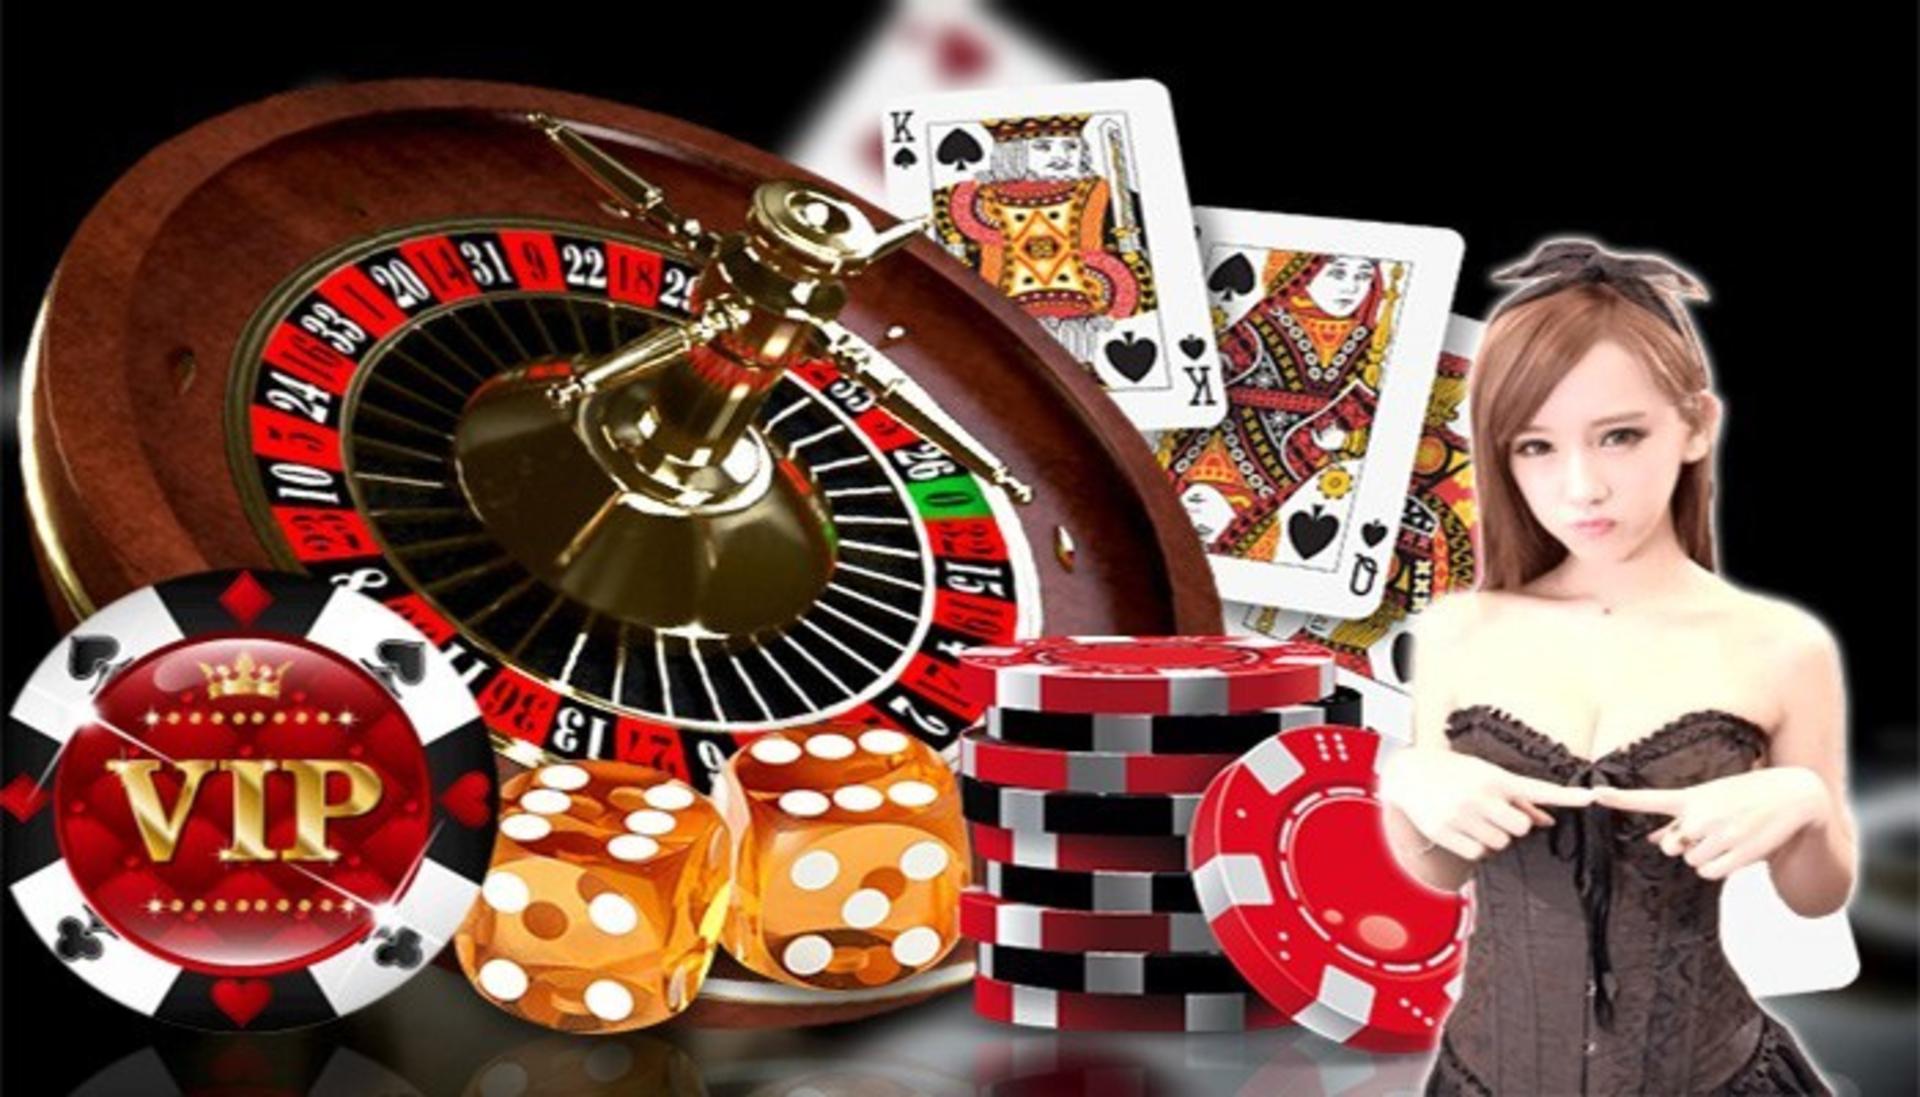 mtammy - Mendapat-Banyak-Keuntungan-Bersama-Agen-Casino-Online-Terbesar-2019